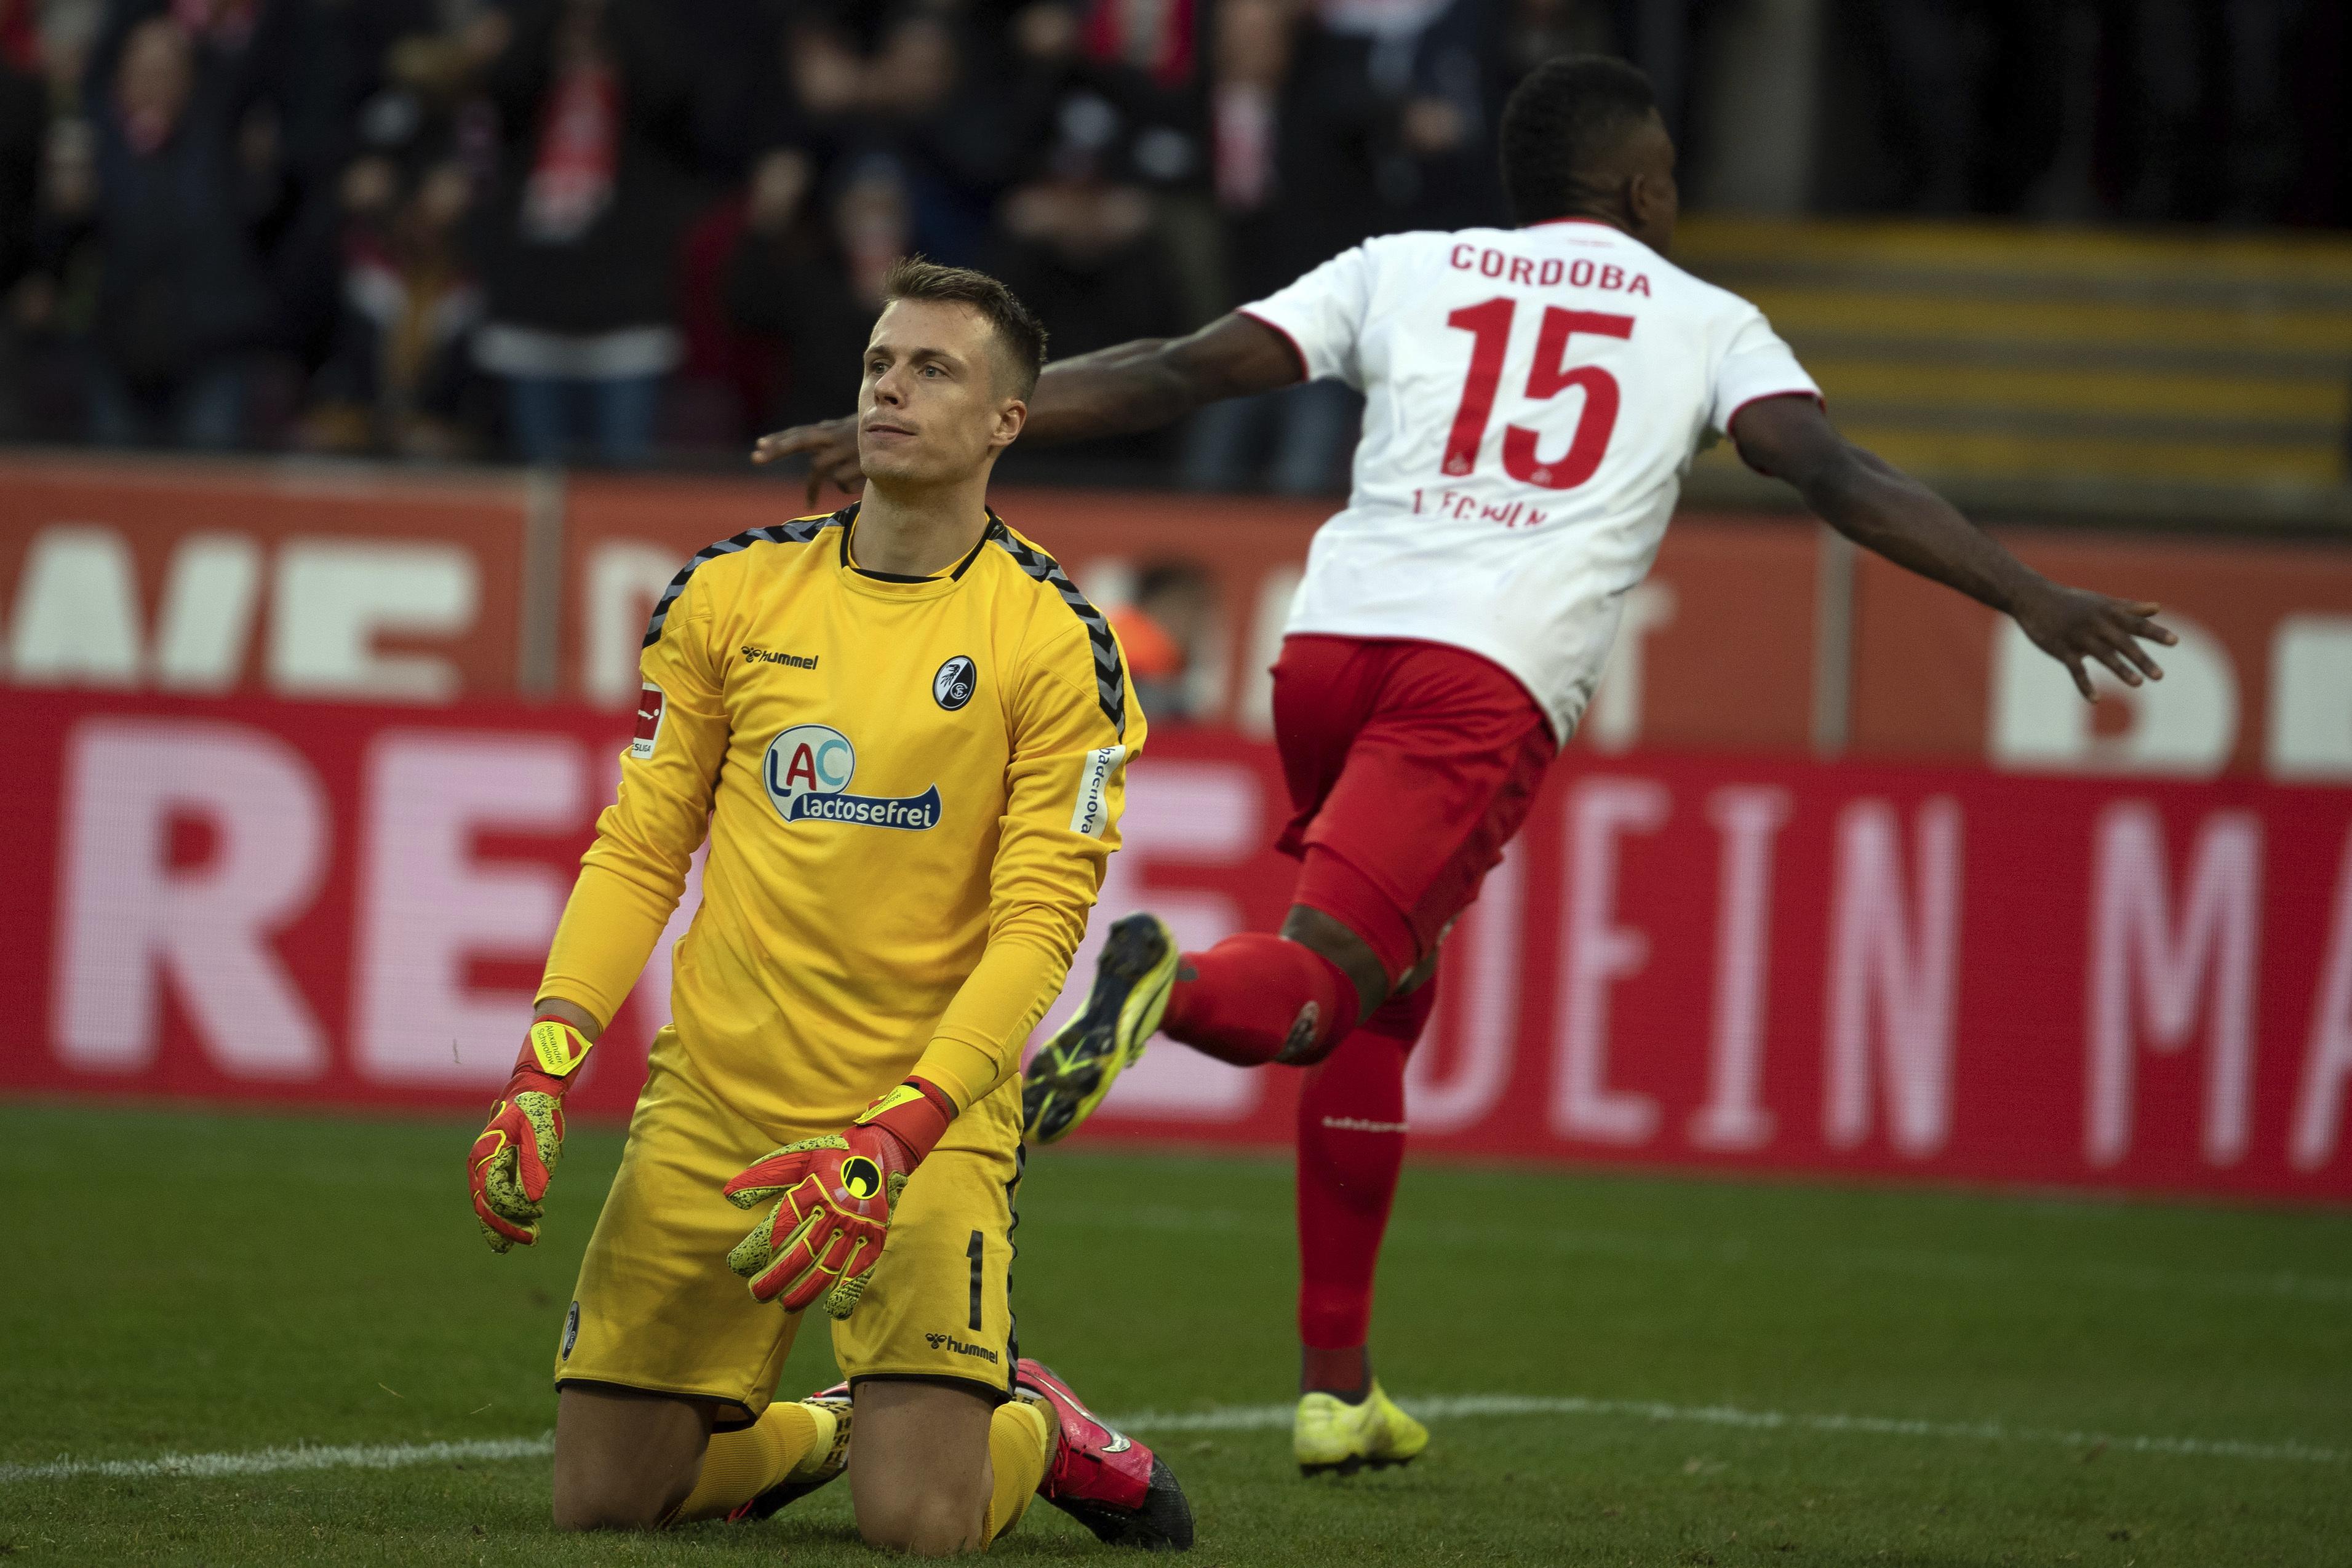 Freiburg's Bundesliga slump continues in 4-0 loss at Cologne